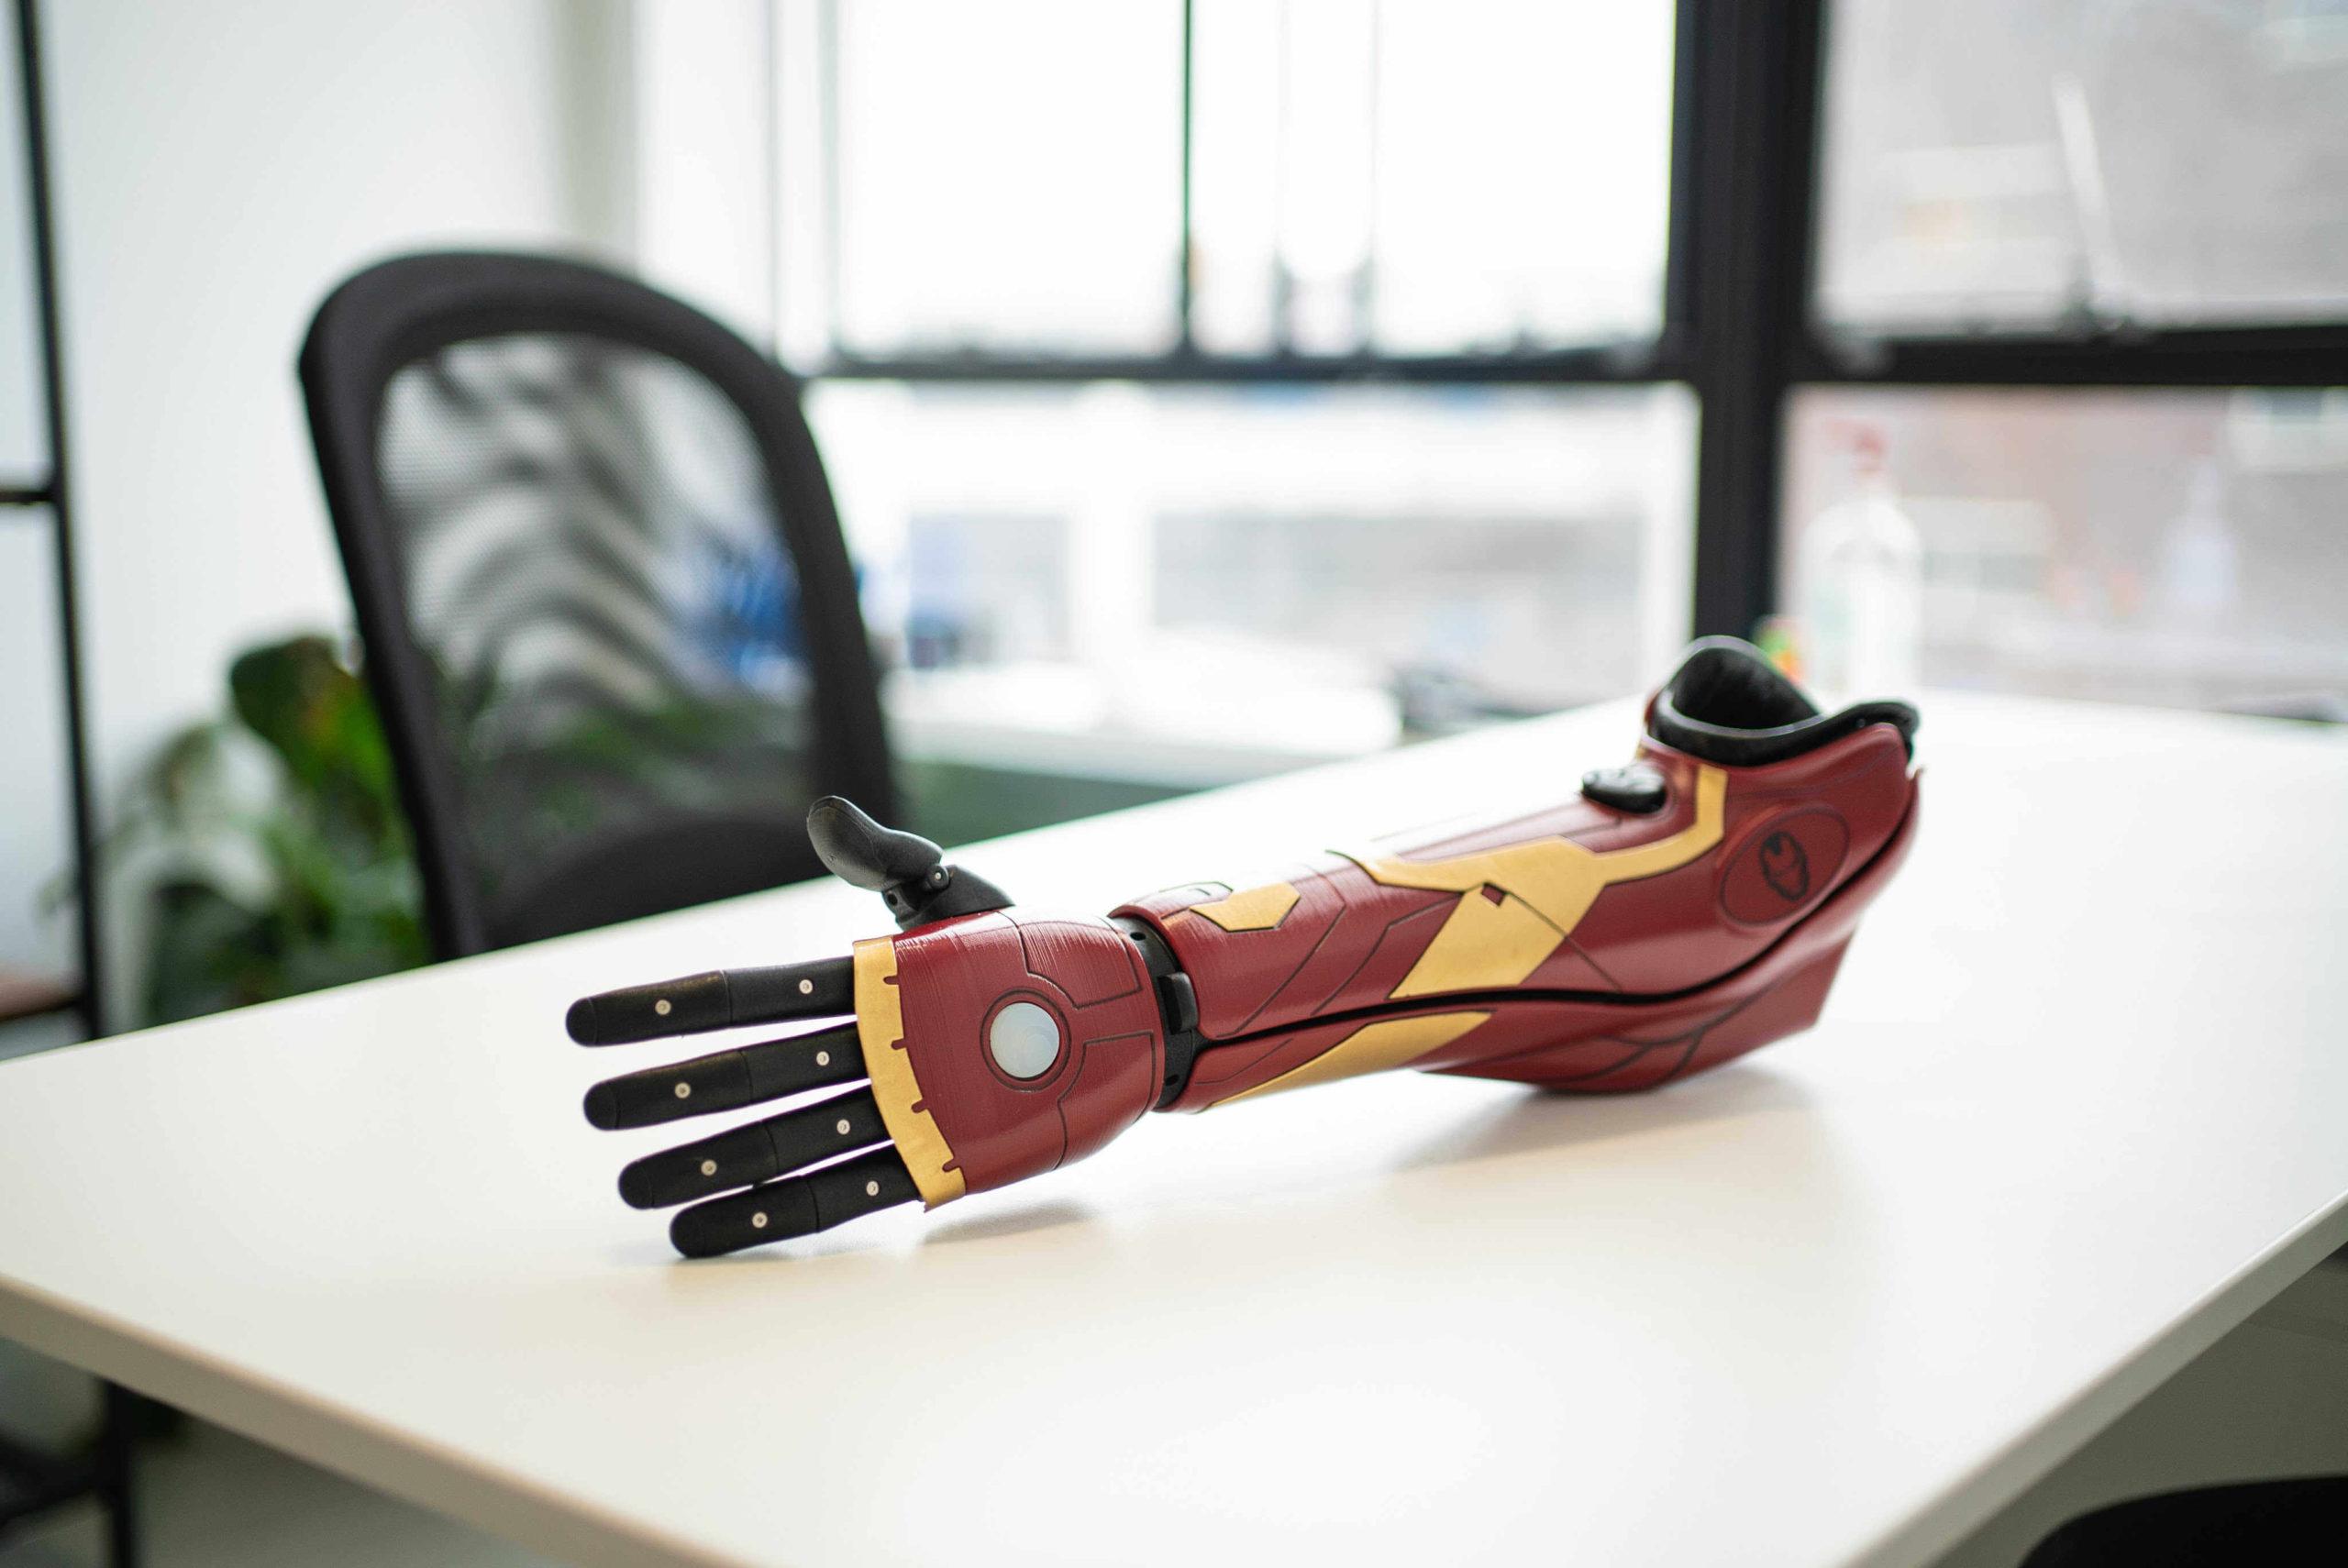 bionic limbs the next prosthetic hook revolution